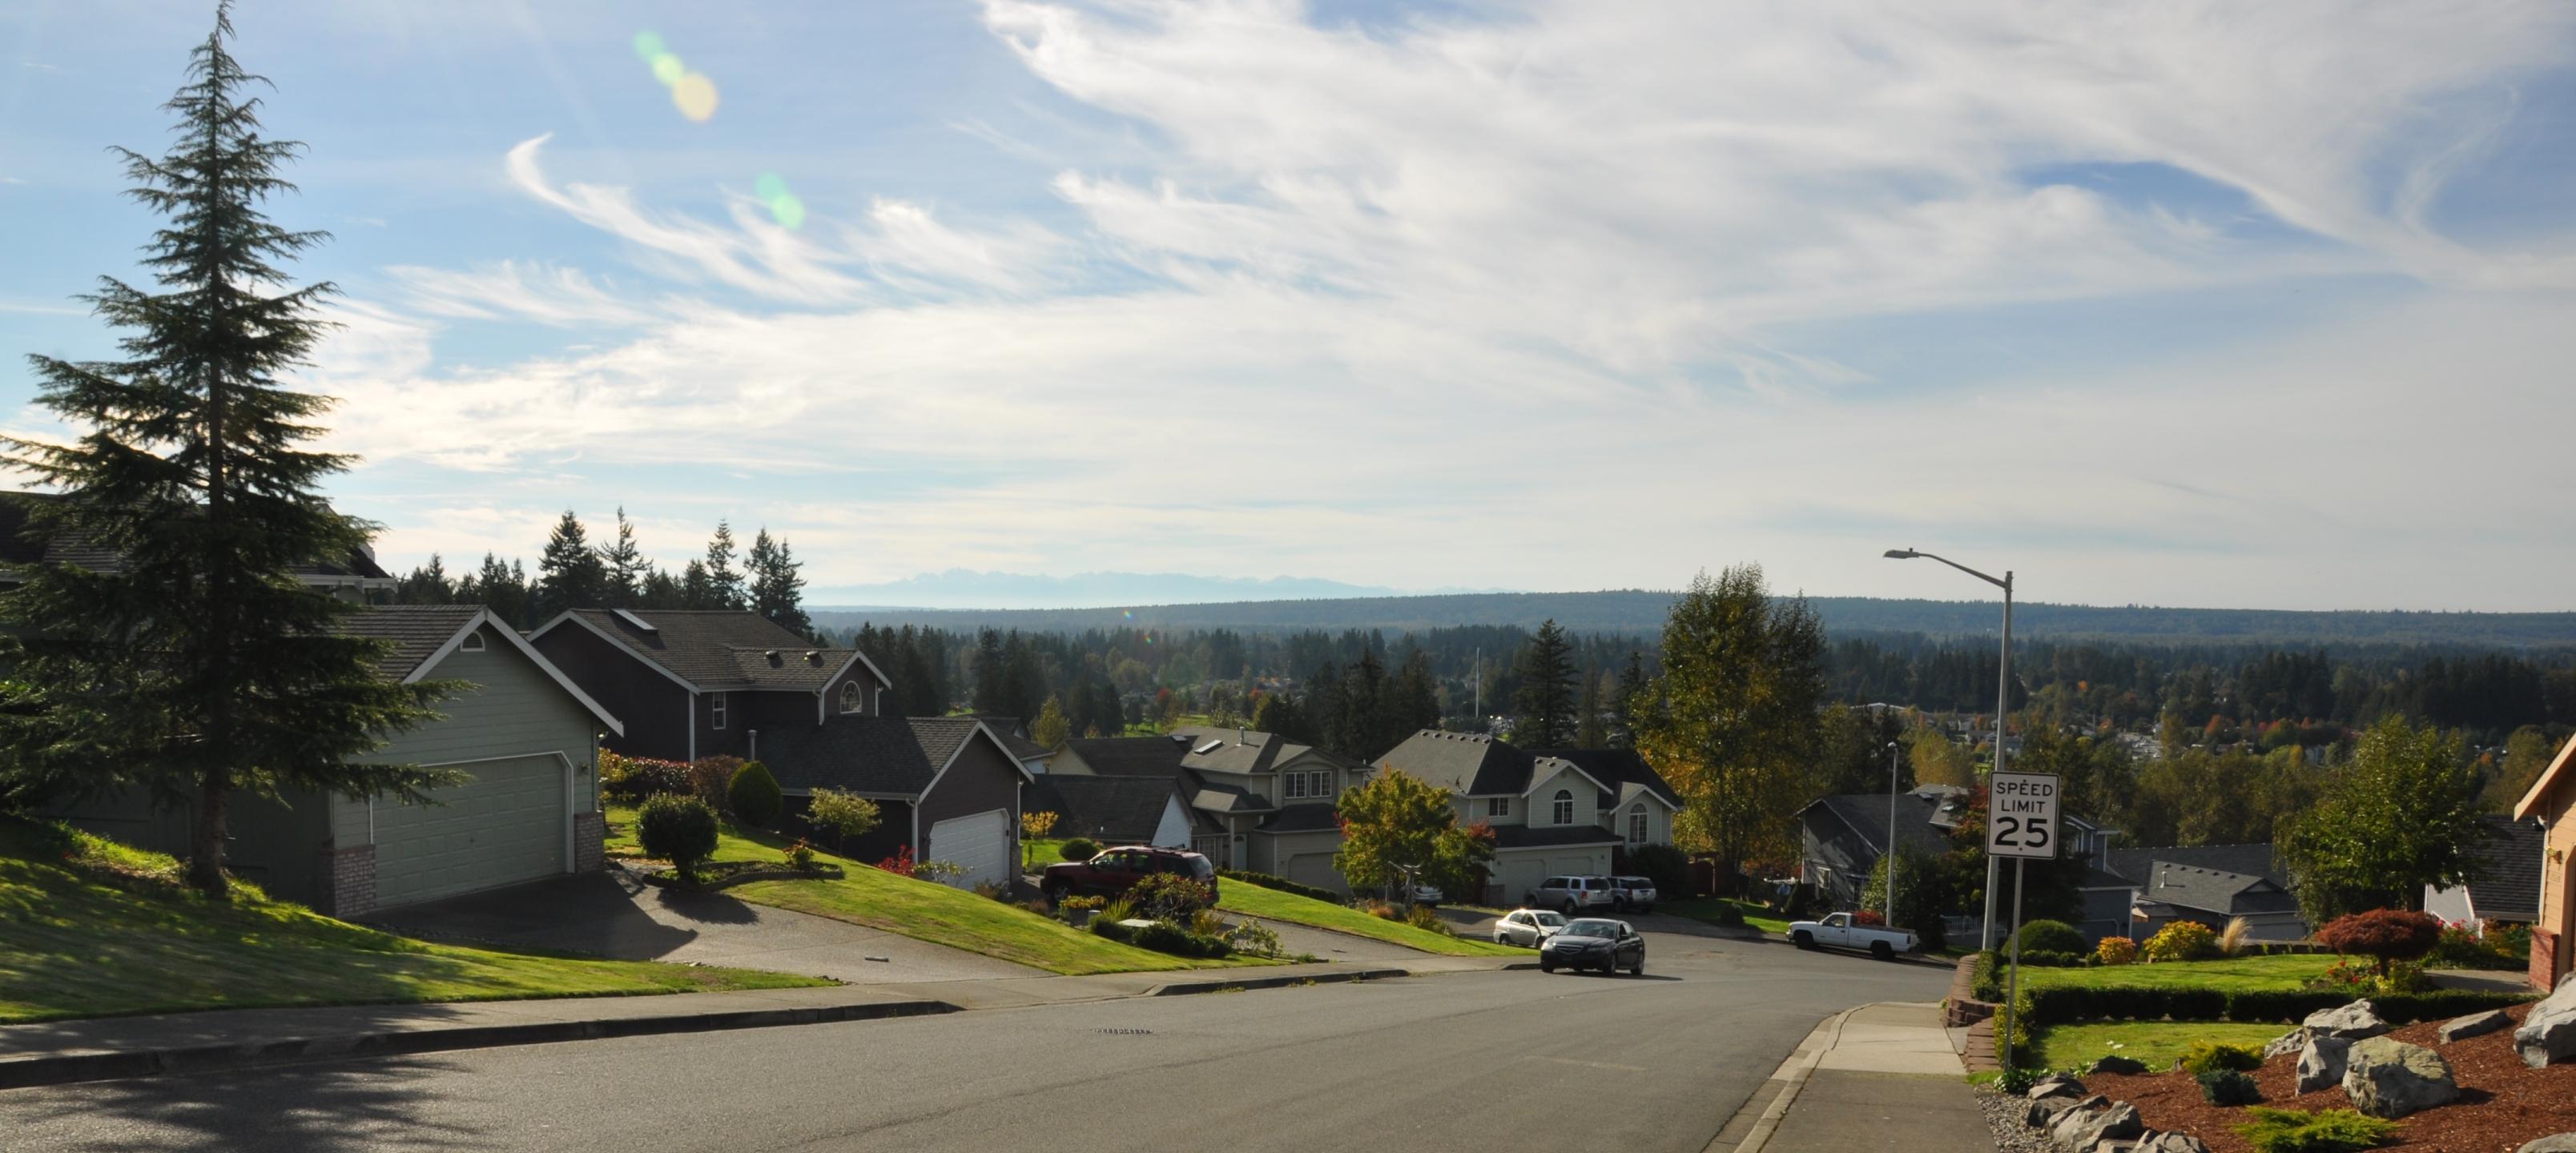 Marysville Homes For Sale Amp Marysville Real Estate